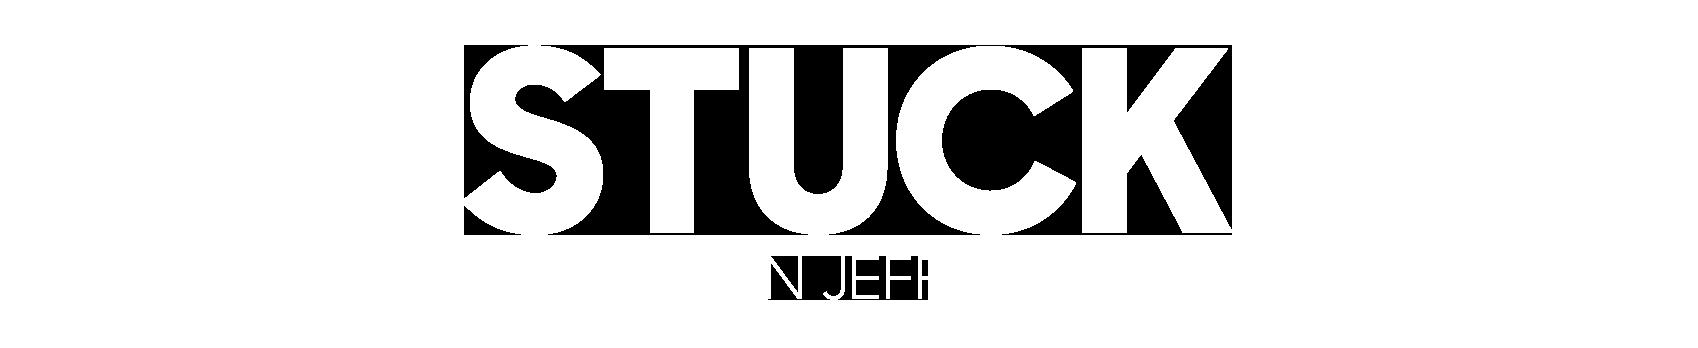 StuckInJeff